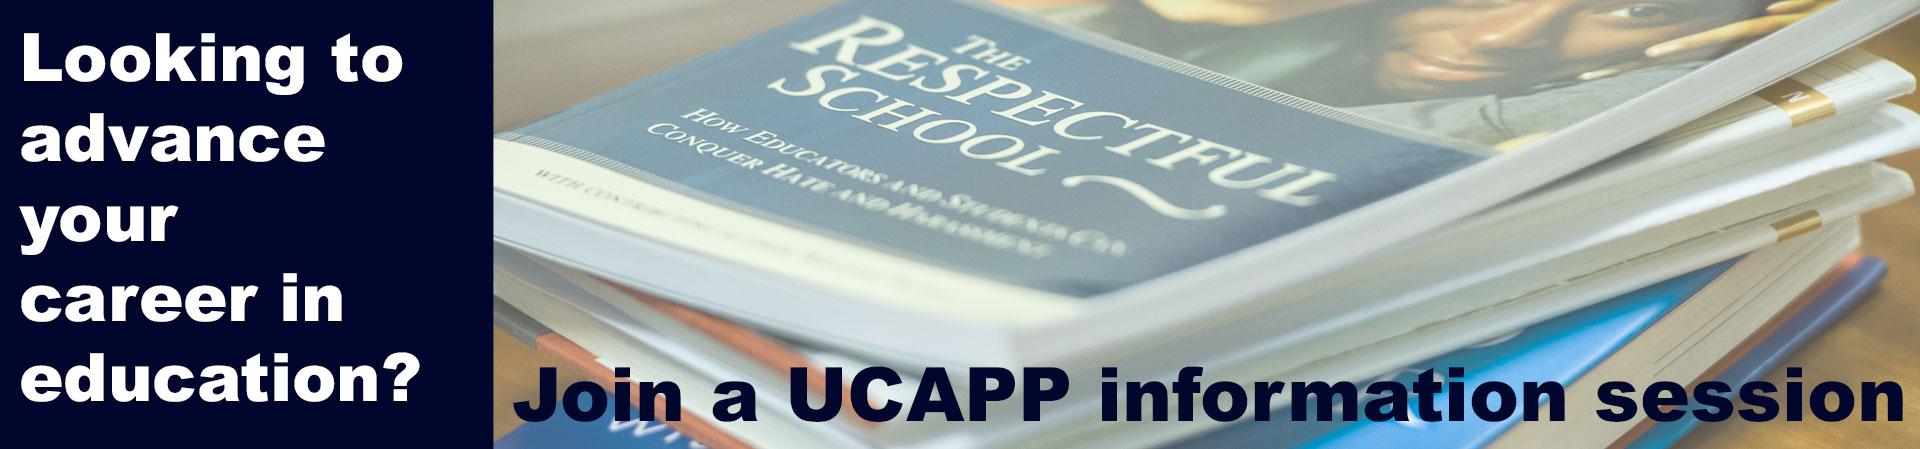 Leadership book highlighting UCAPP info sessions 2017